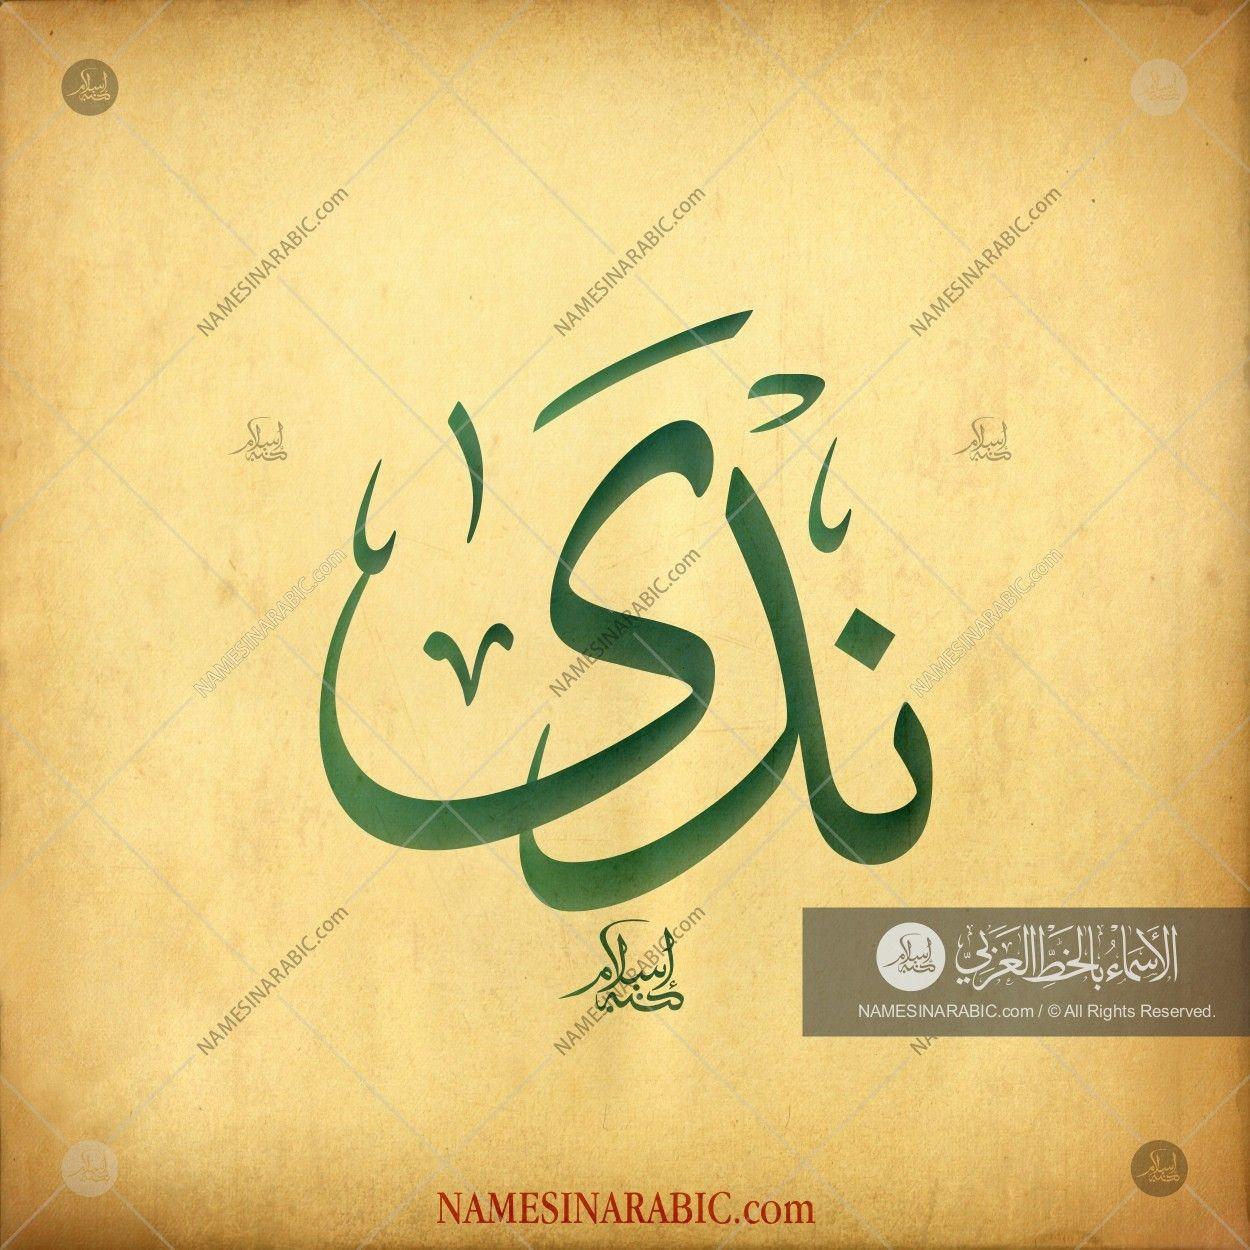 Nada ندى Names In Arabic Calligraphy Name 3719 Calligraphy Name Islamic Calligraphy Painting Calligraphy